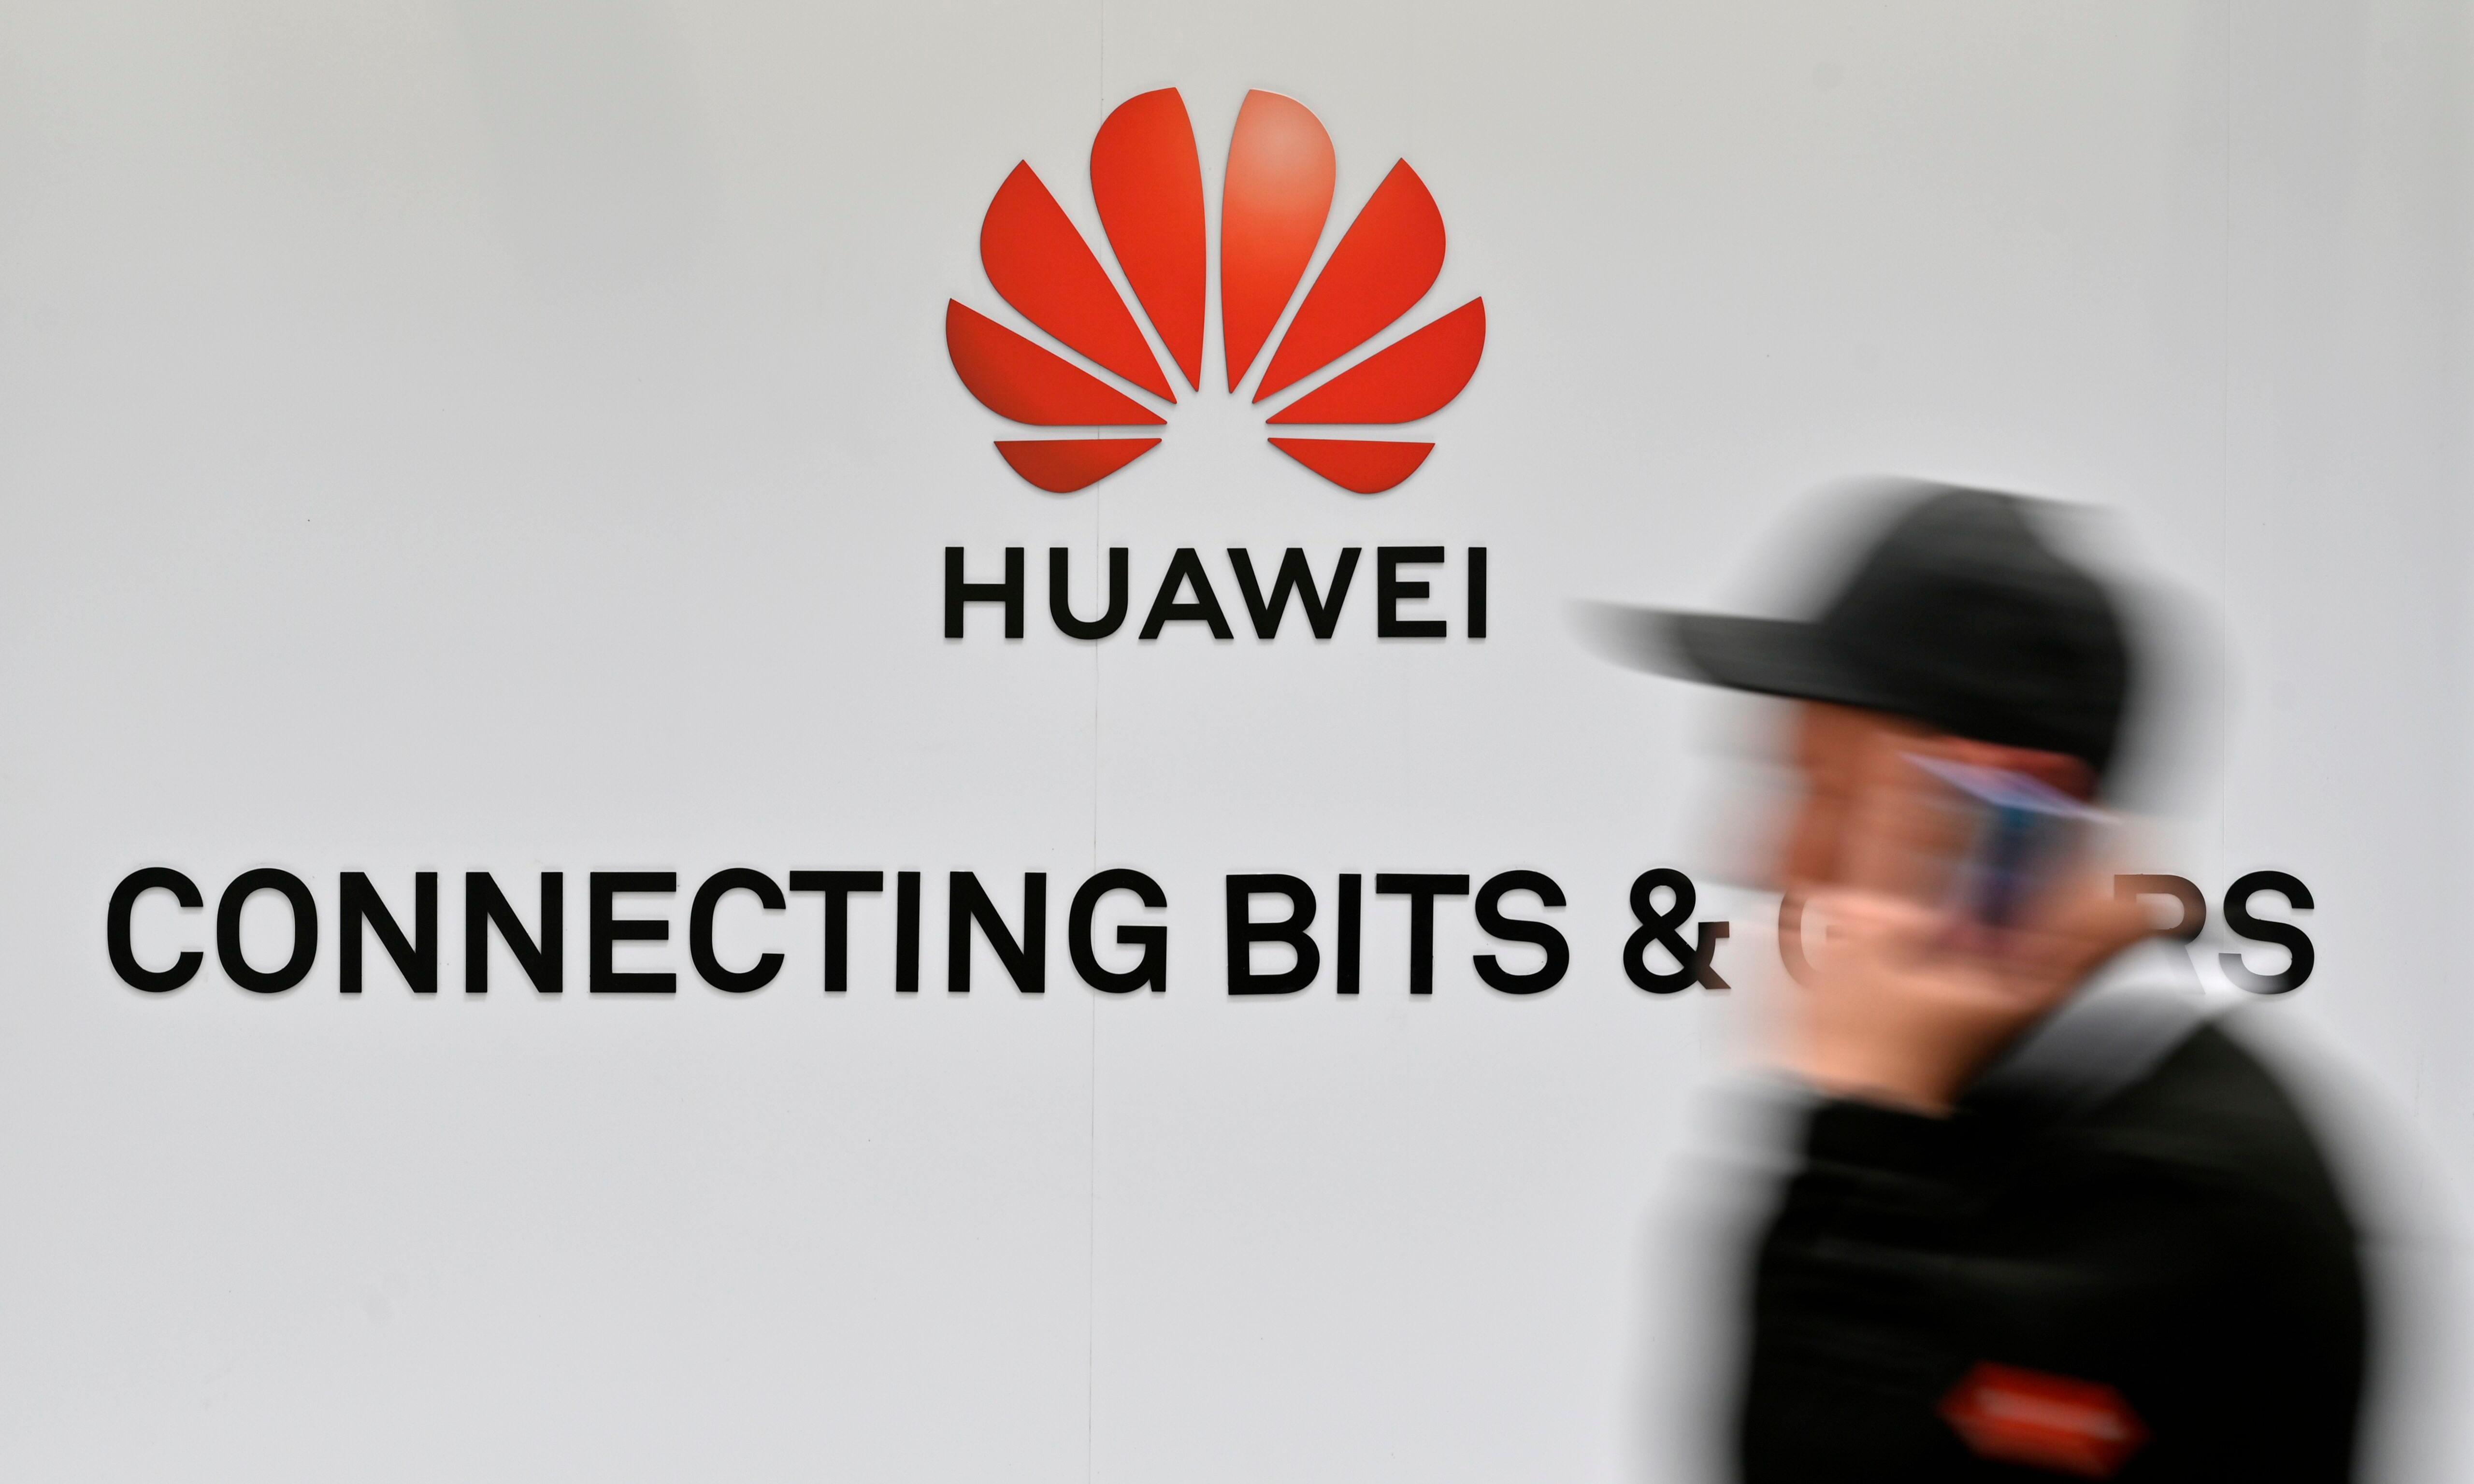 Google's Huawei ban is good news: tech giants shouldn't always get their way